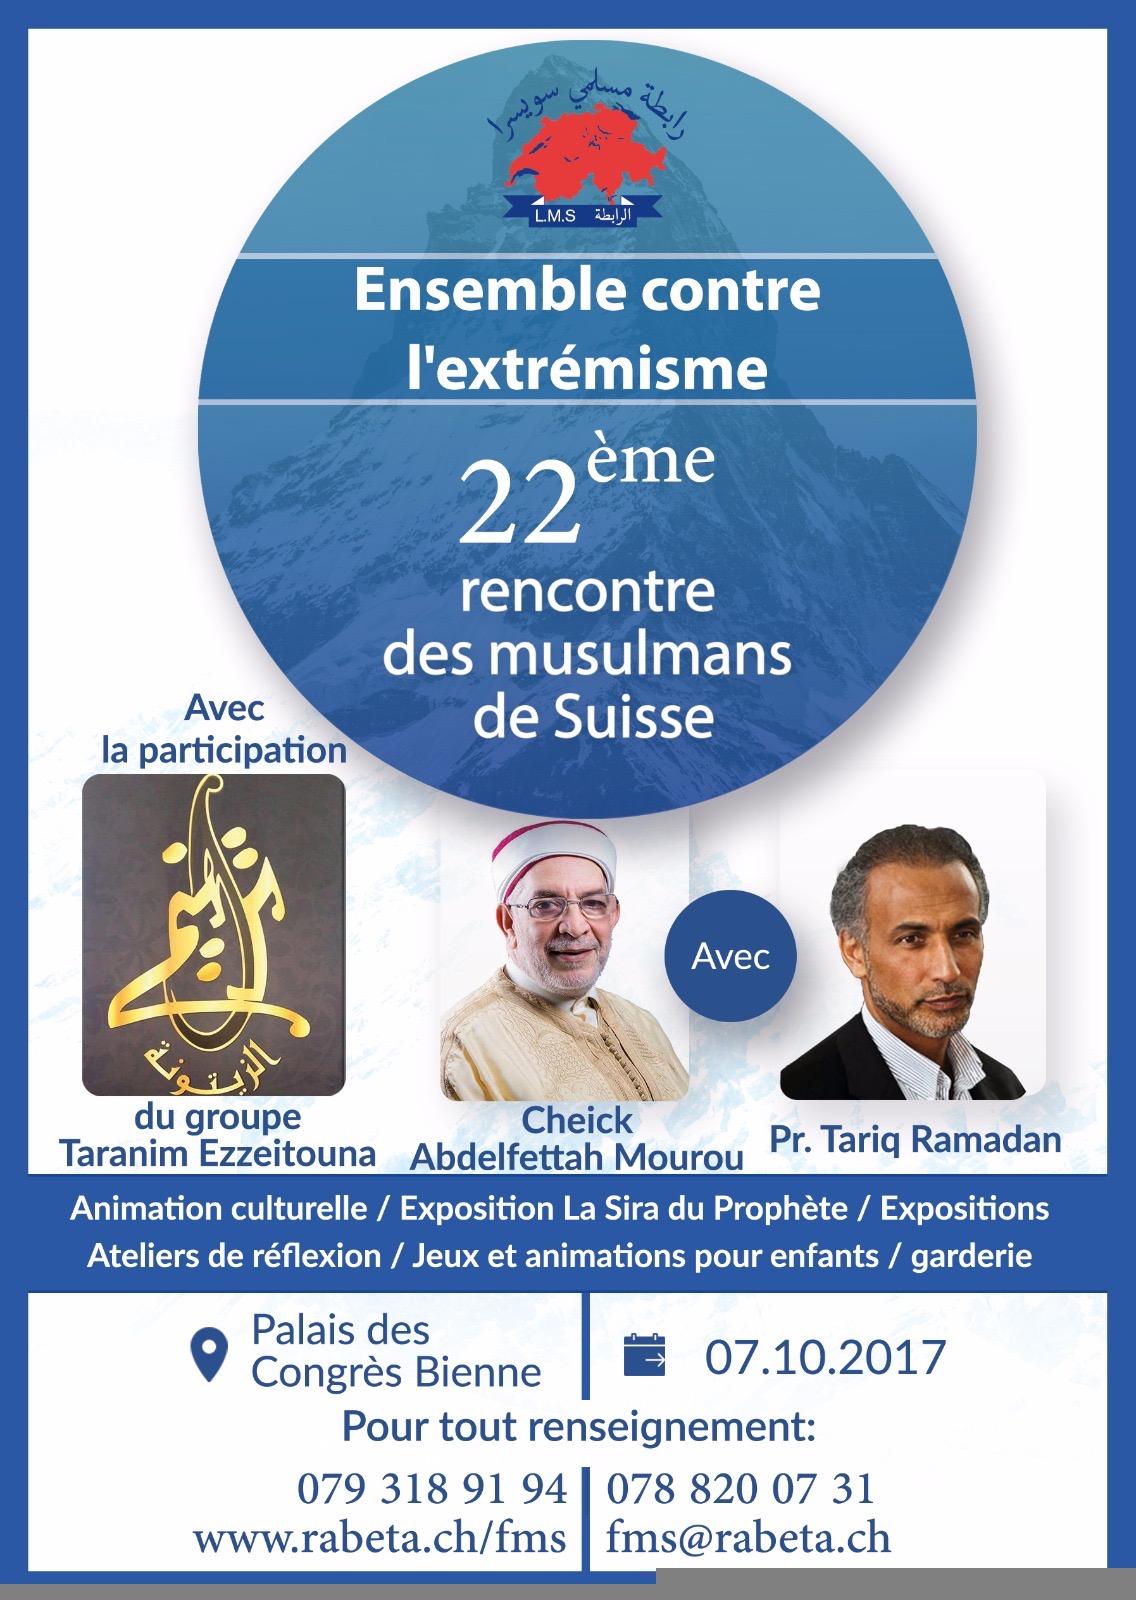 Site rencontre musulman suisse